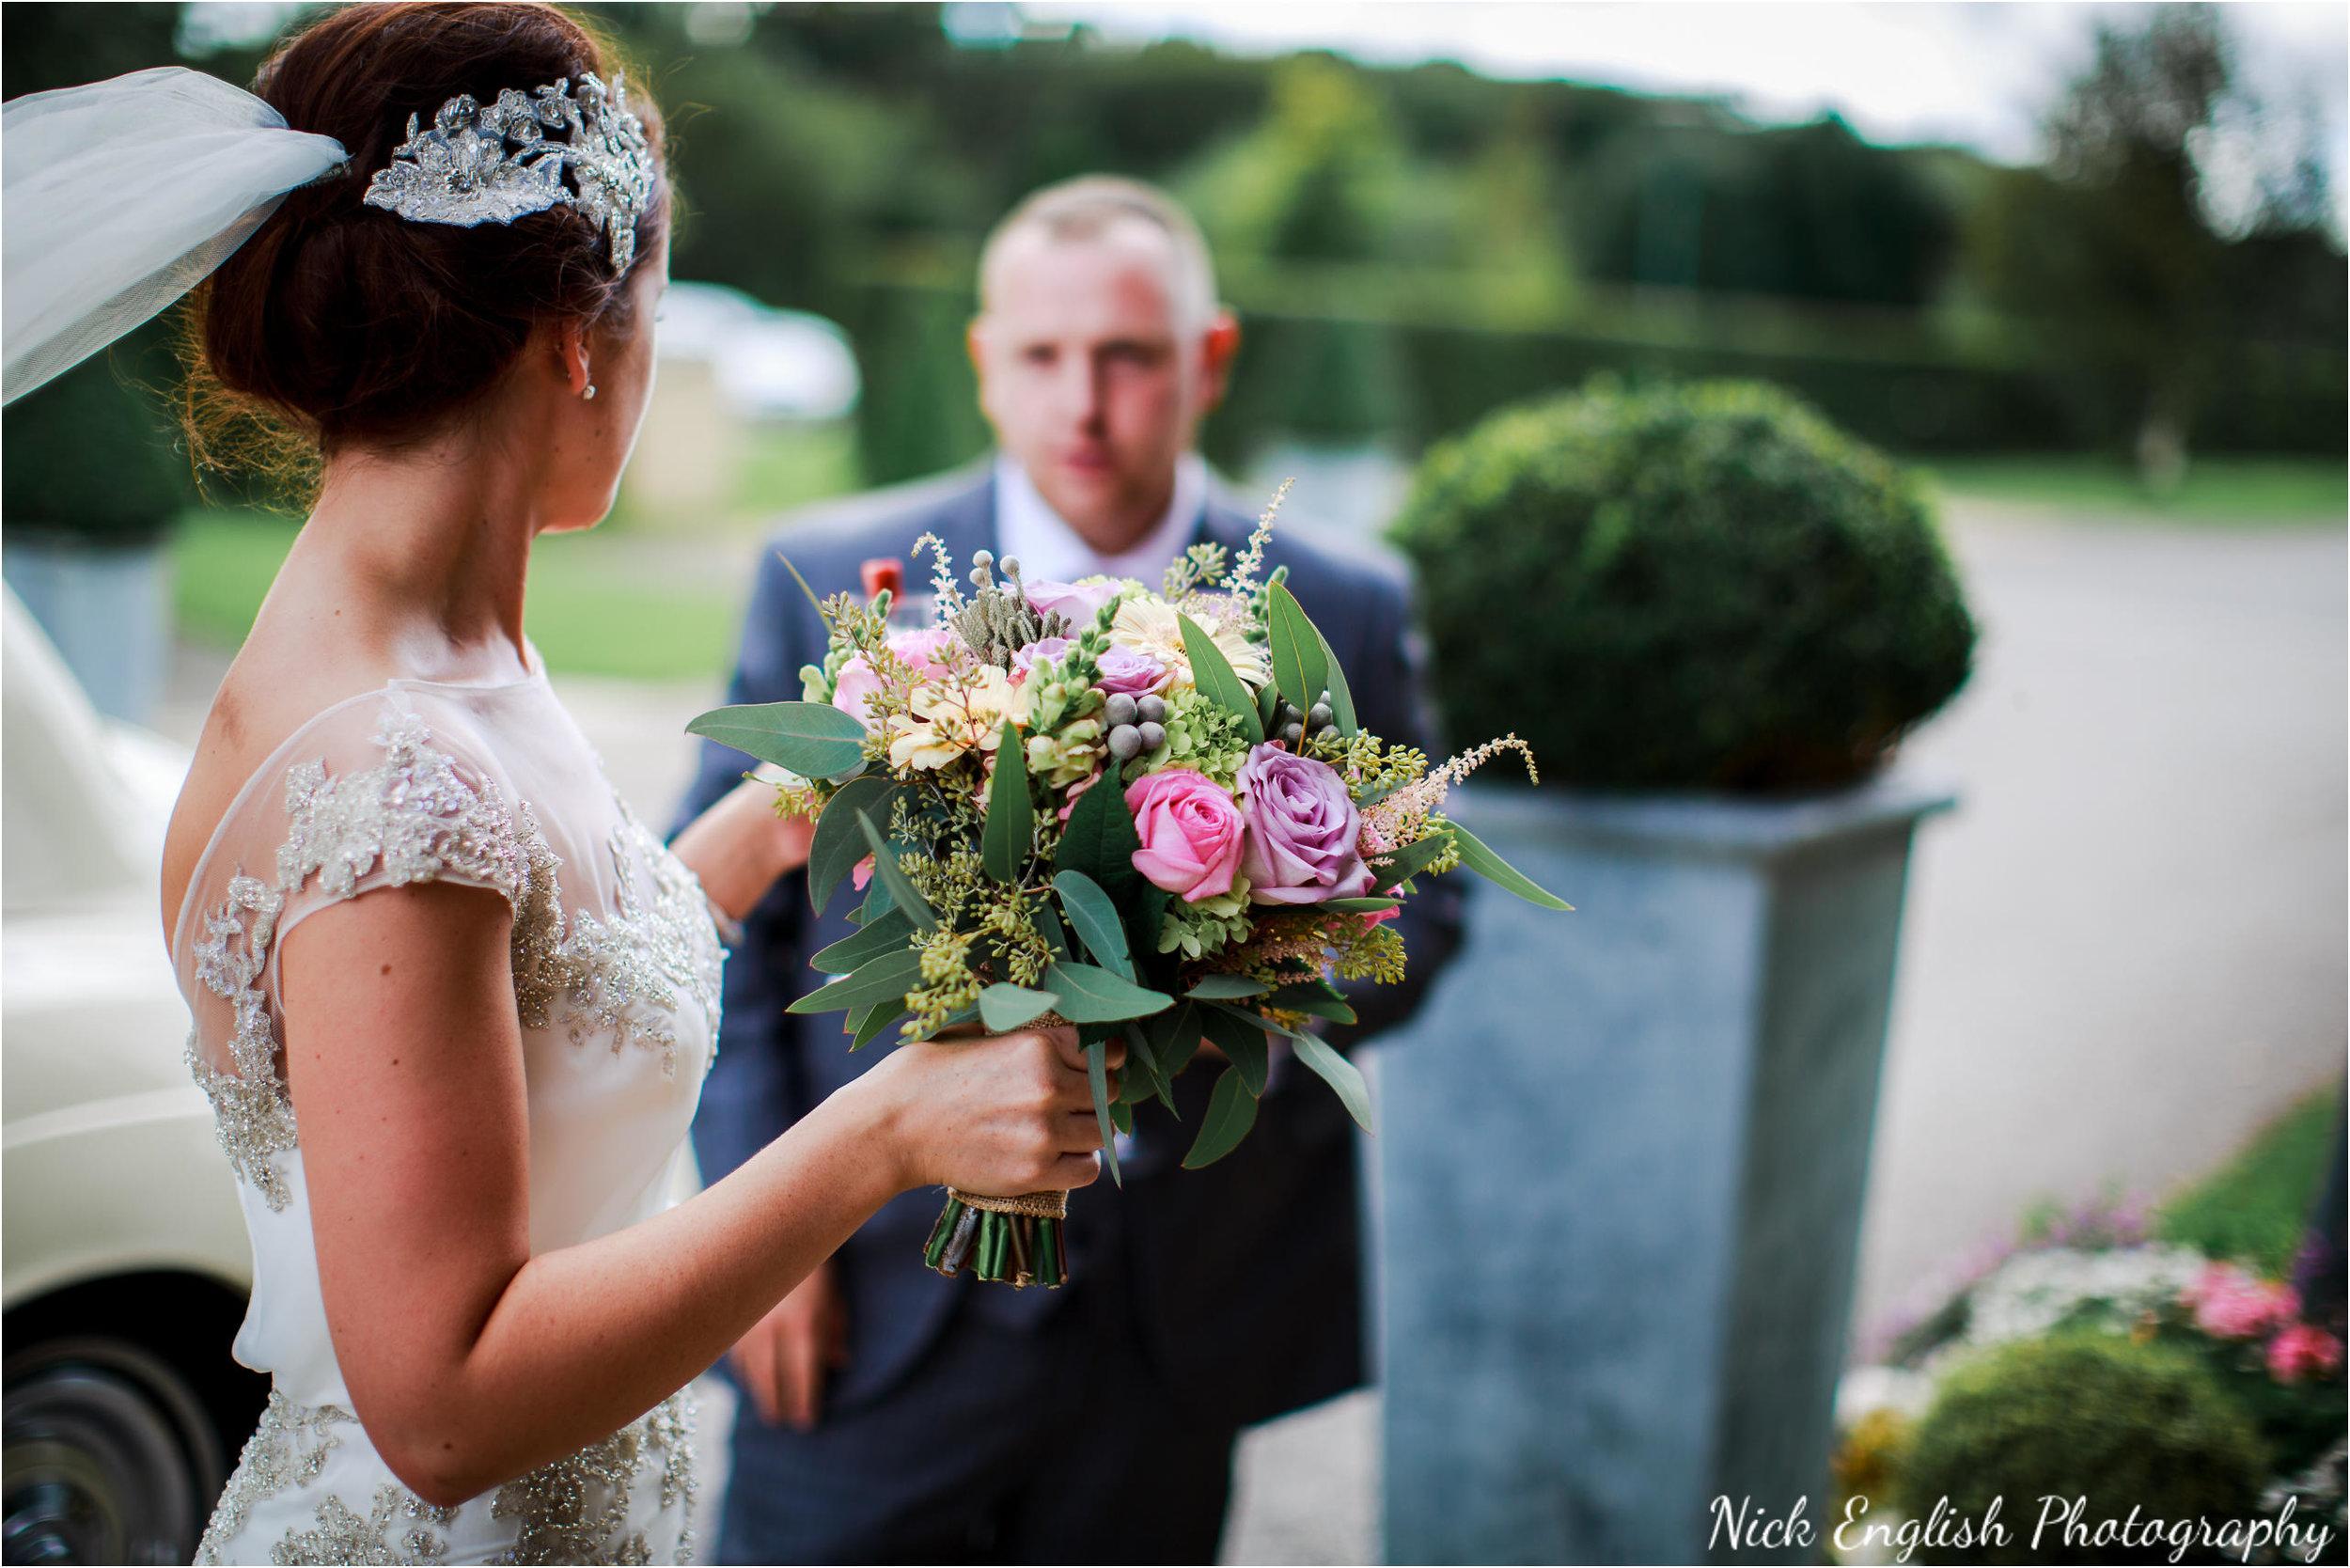 Stacey-Ash-Wedding-Photographs-Stanley-House-Preston-Lancashire-105.jpg